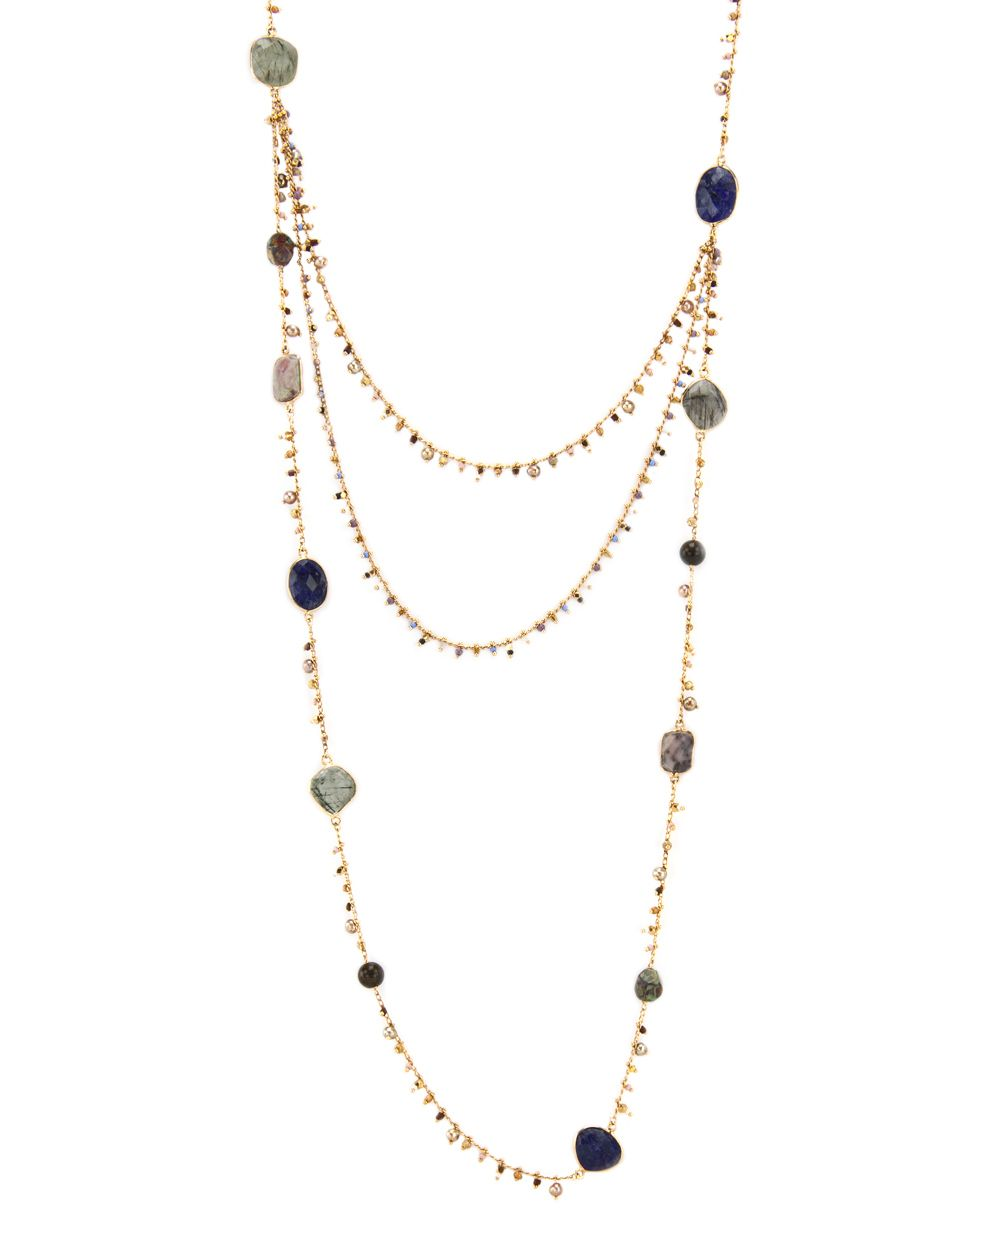 Serti Pondicherie long necklace - Metallic Gas Bijoux 520LaF